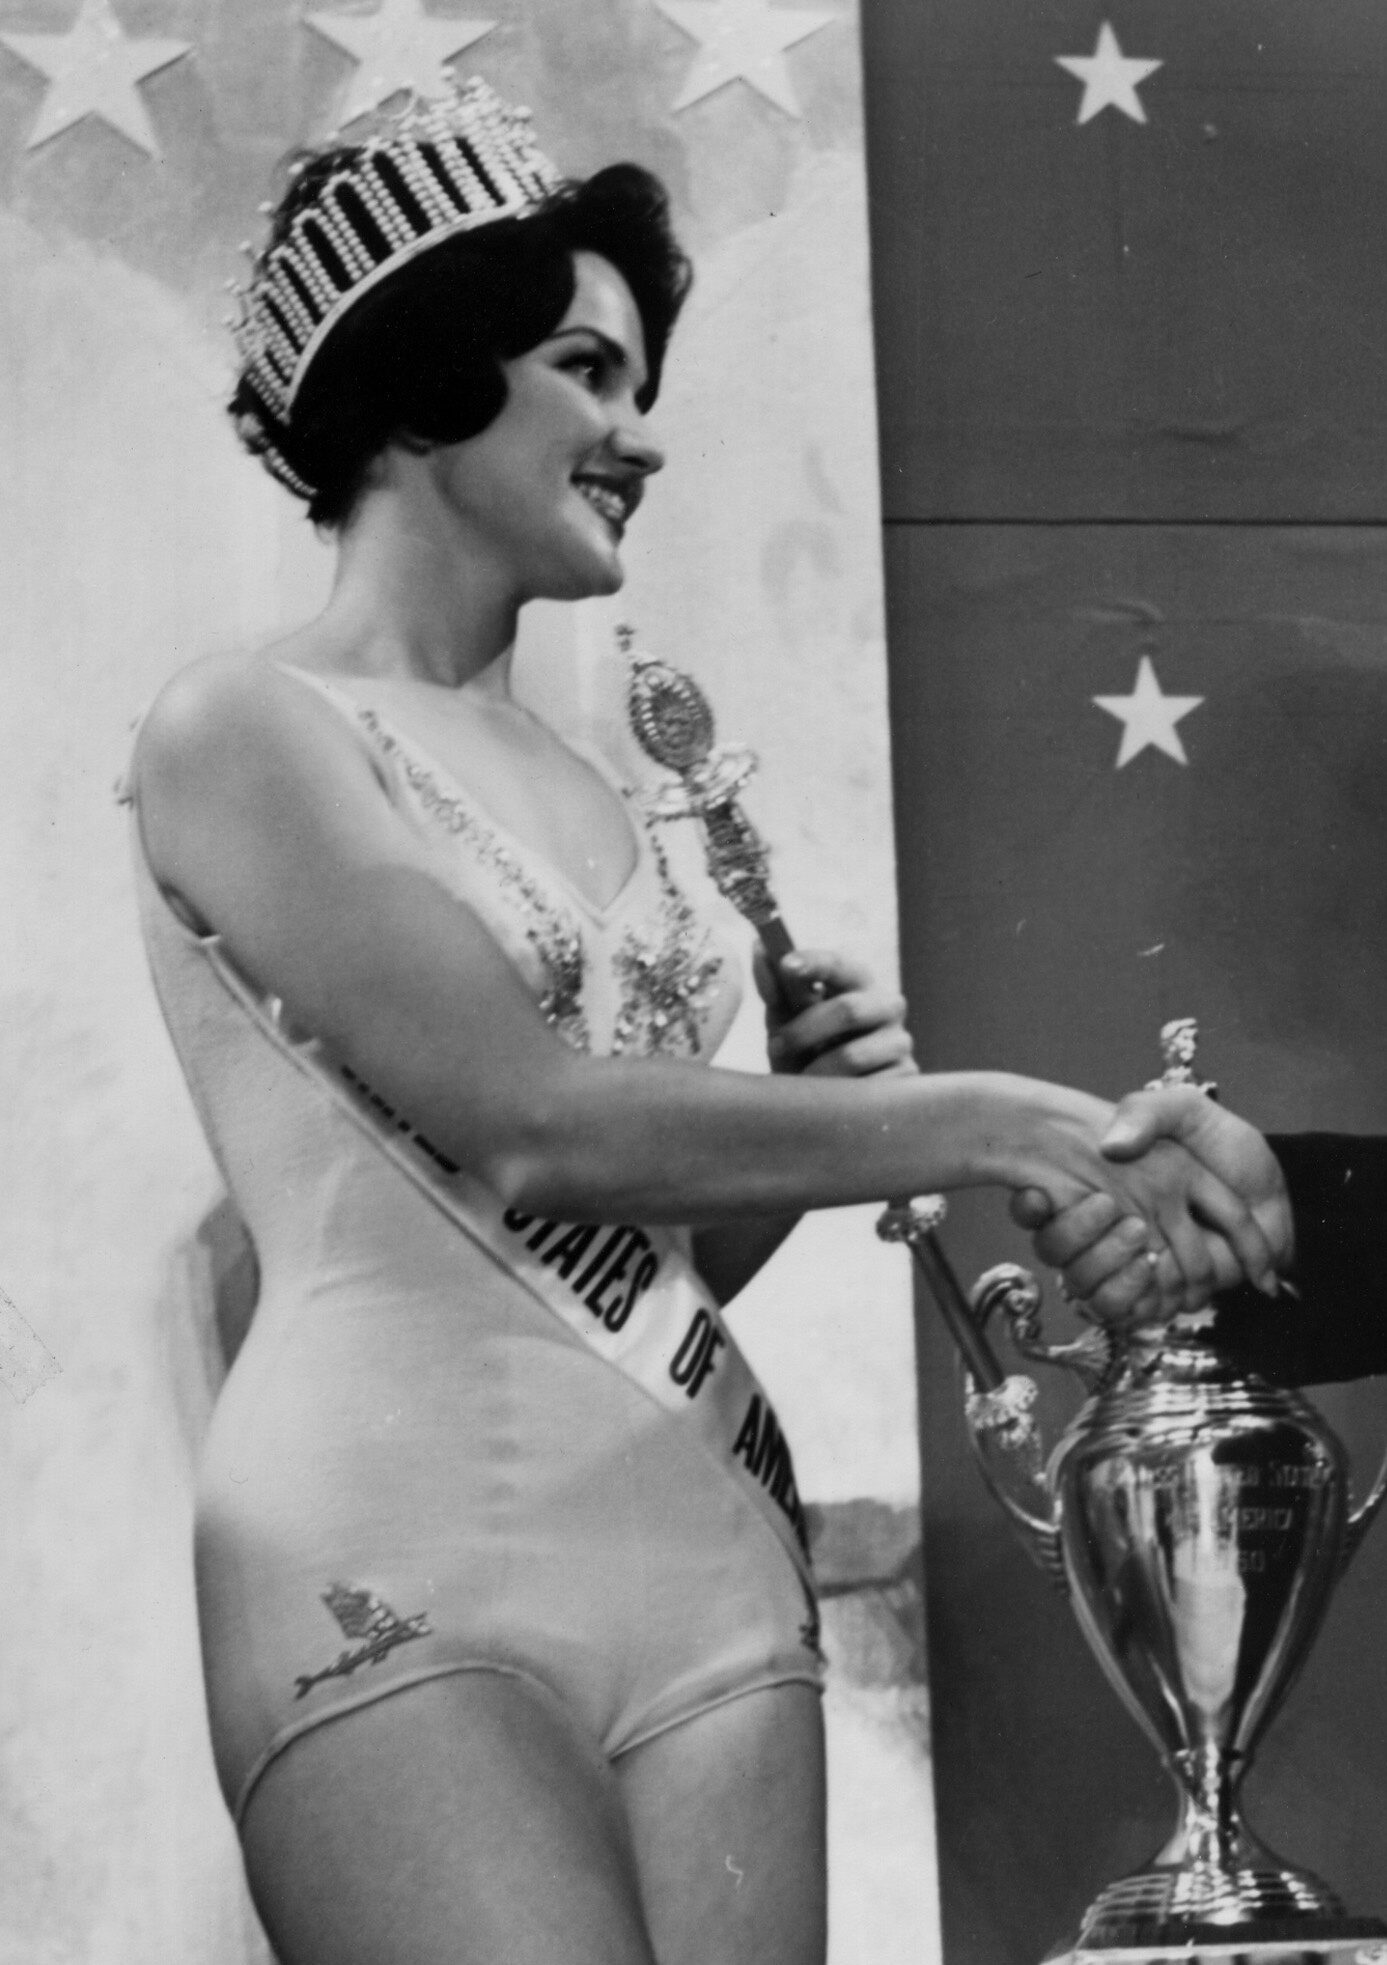 Miss Universe 1960 Miss USA Linda Bement